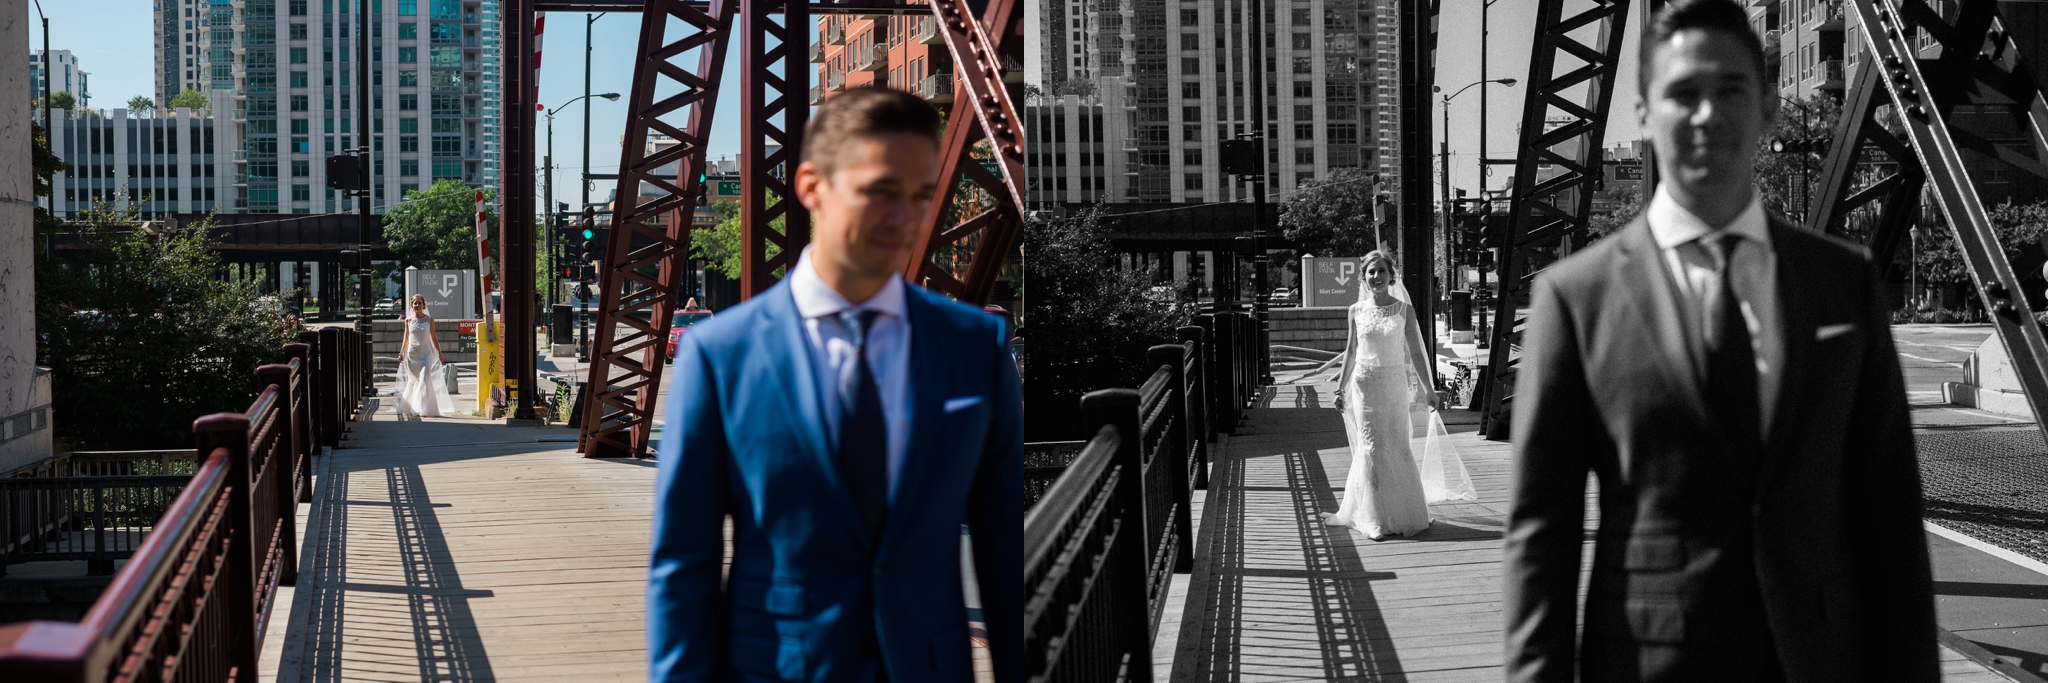 West-Supply-Foundry-Chicago-Wedding-033.jpg